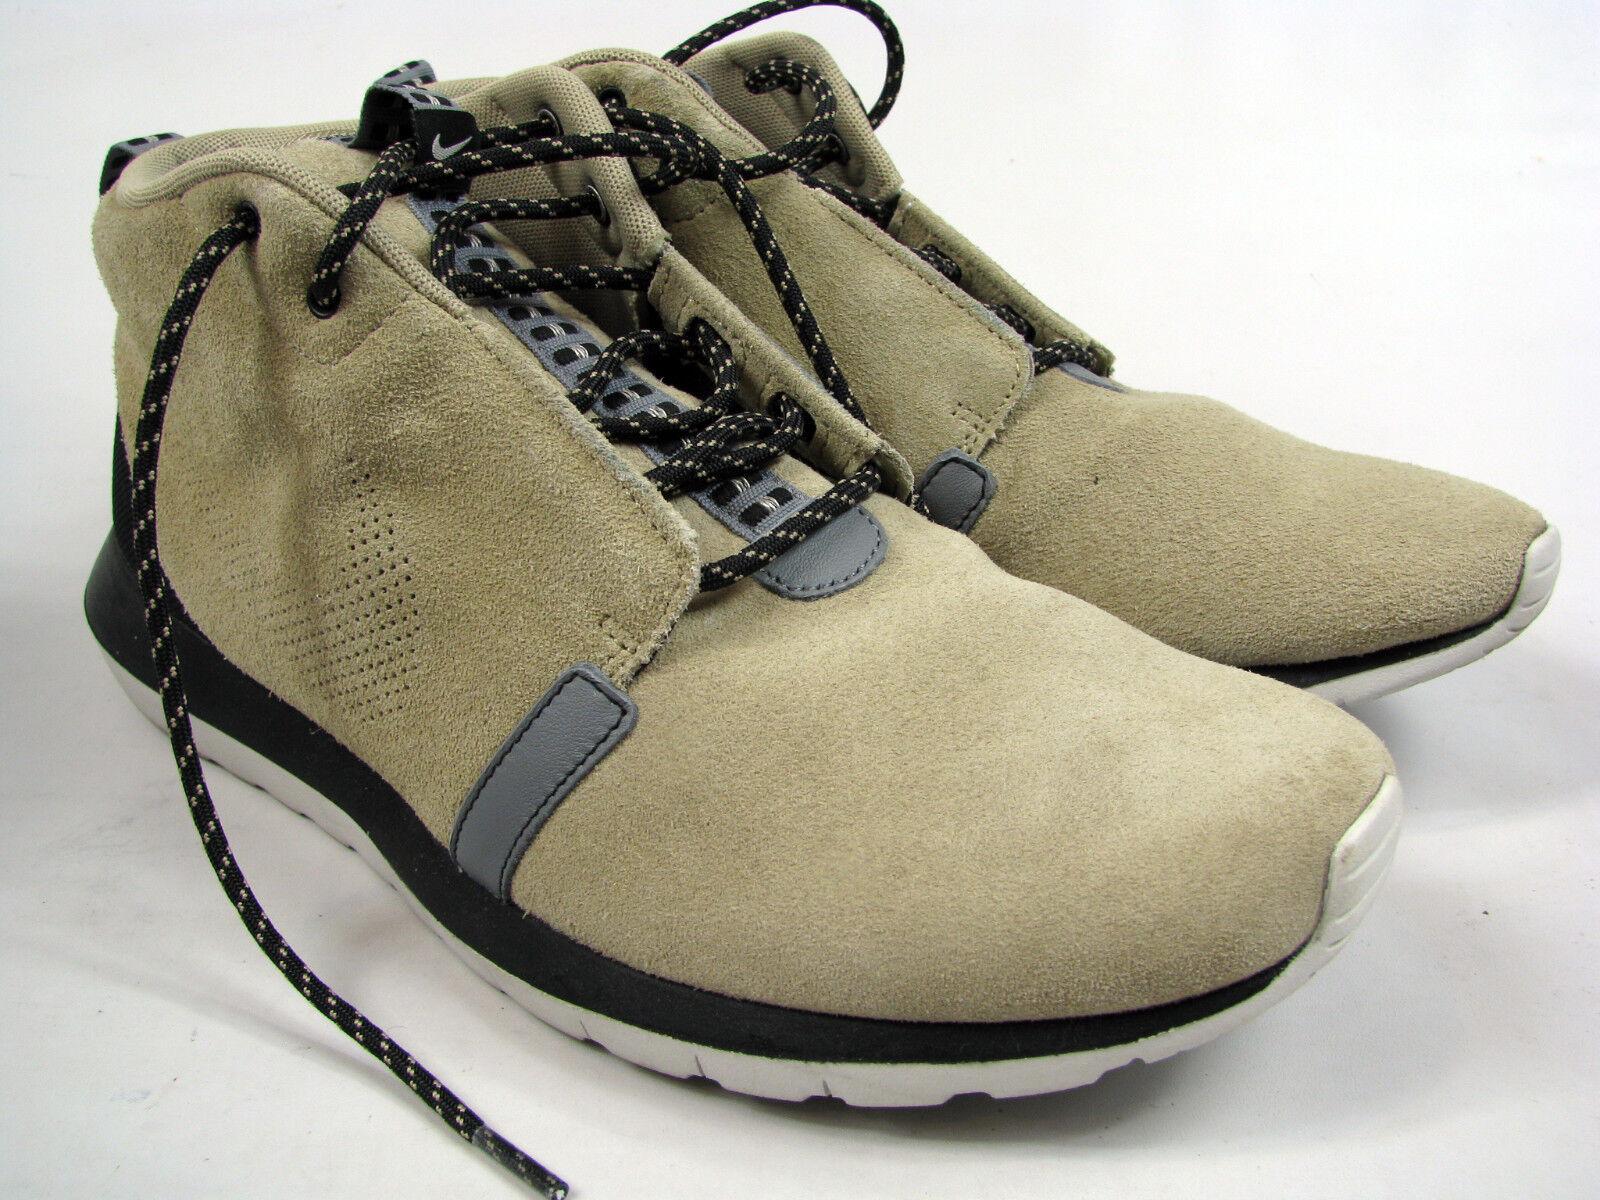 Nike Mens Roshe Rosherun NM Sneakerboot Shoes 684723 200 Sz 10.5 Bamboo Black